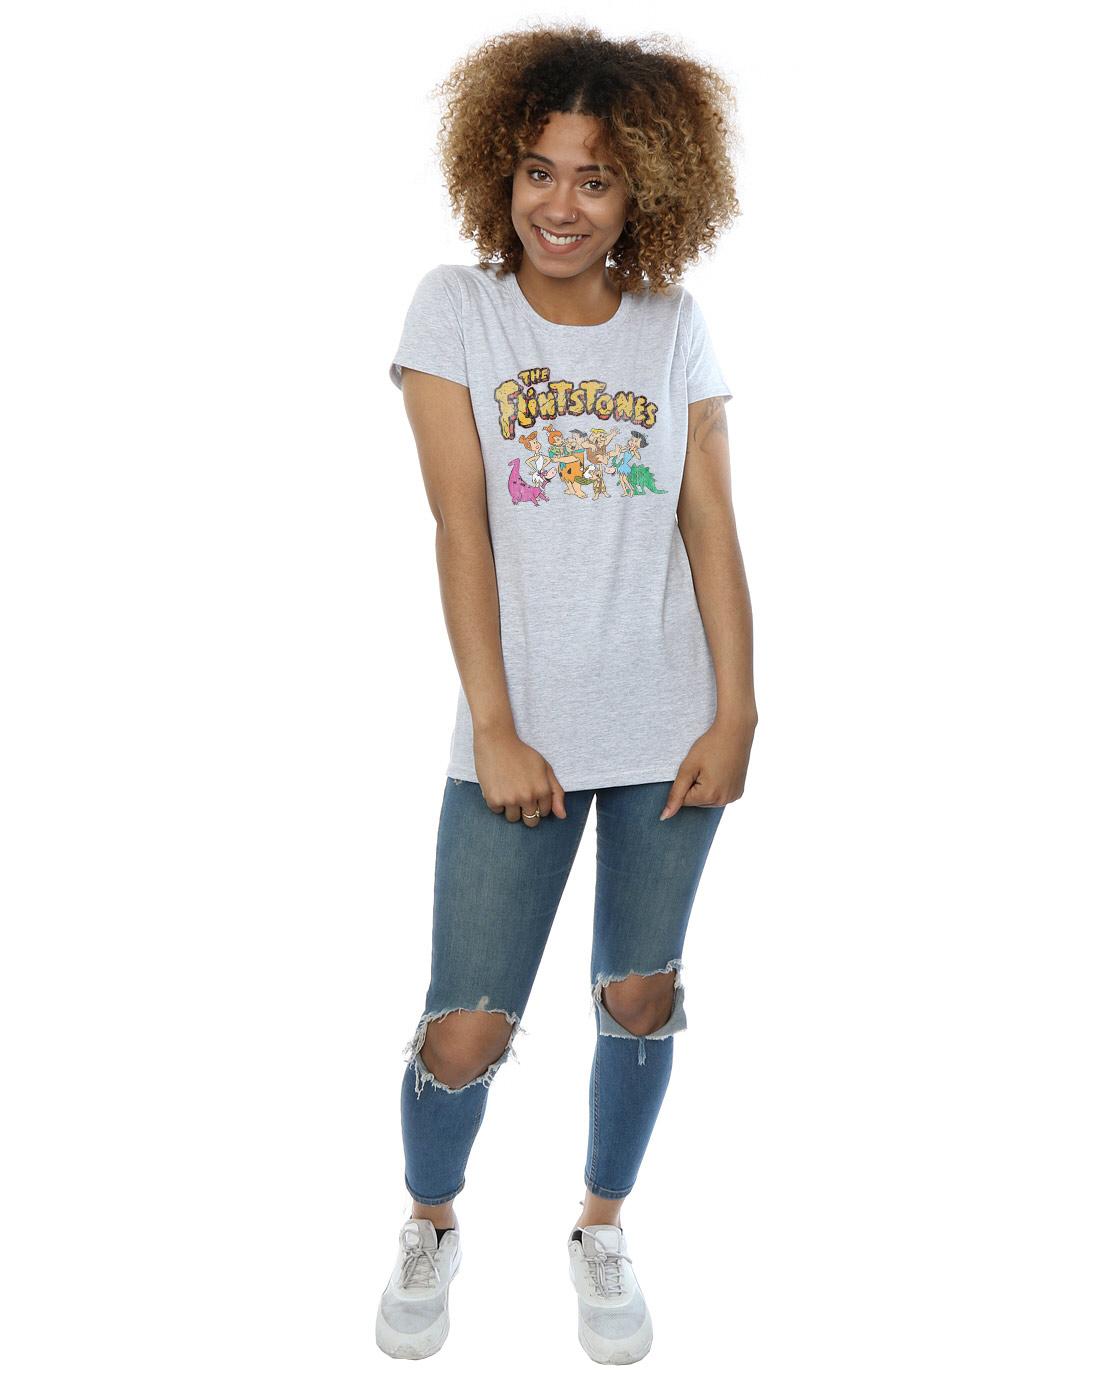 The-Flintstones-Women-039-s-Group-Distressed-T-Shirt thumbnail 15